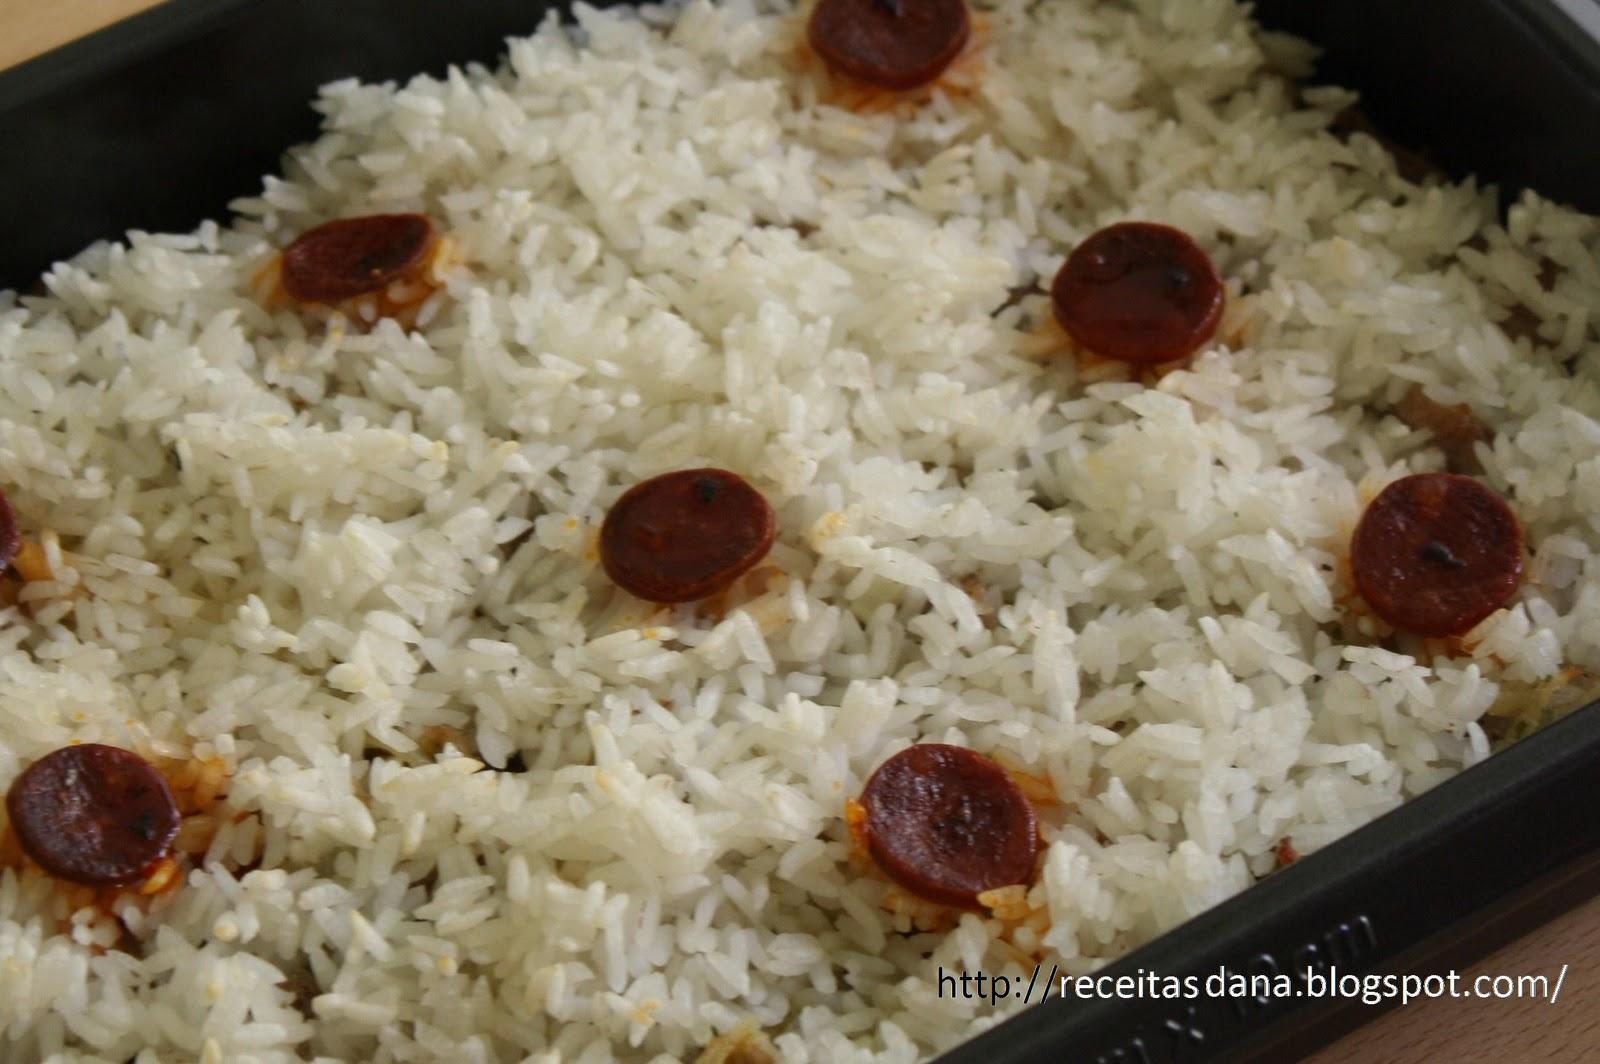 ... pollo arroz abanda arroz con pollo arroz tapado arroz con pollo arroz